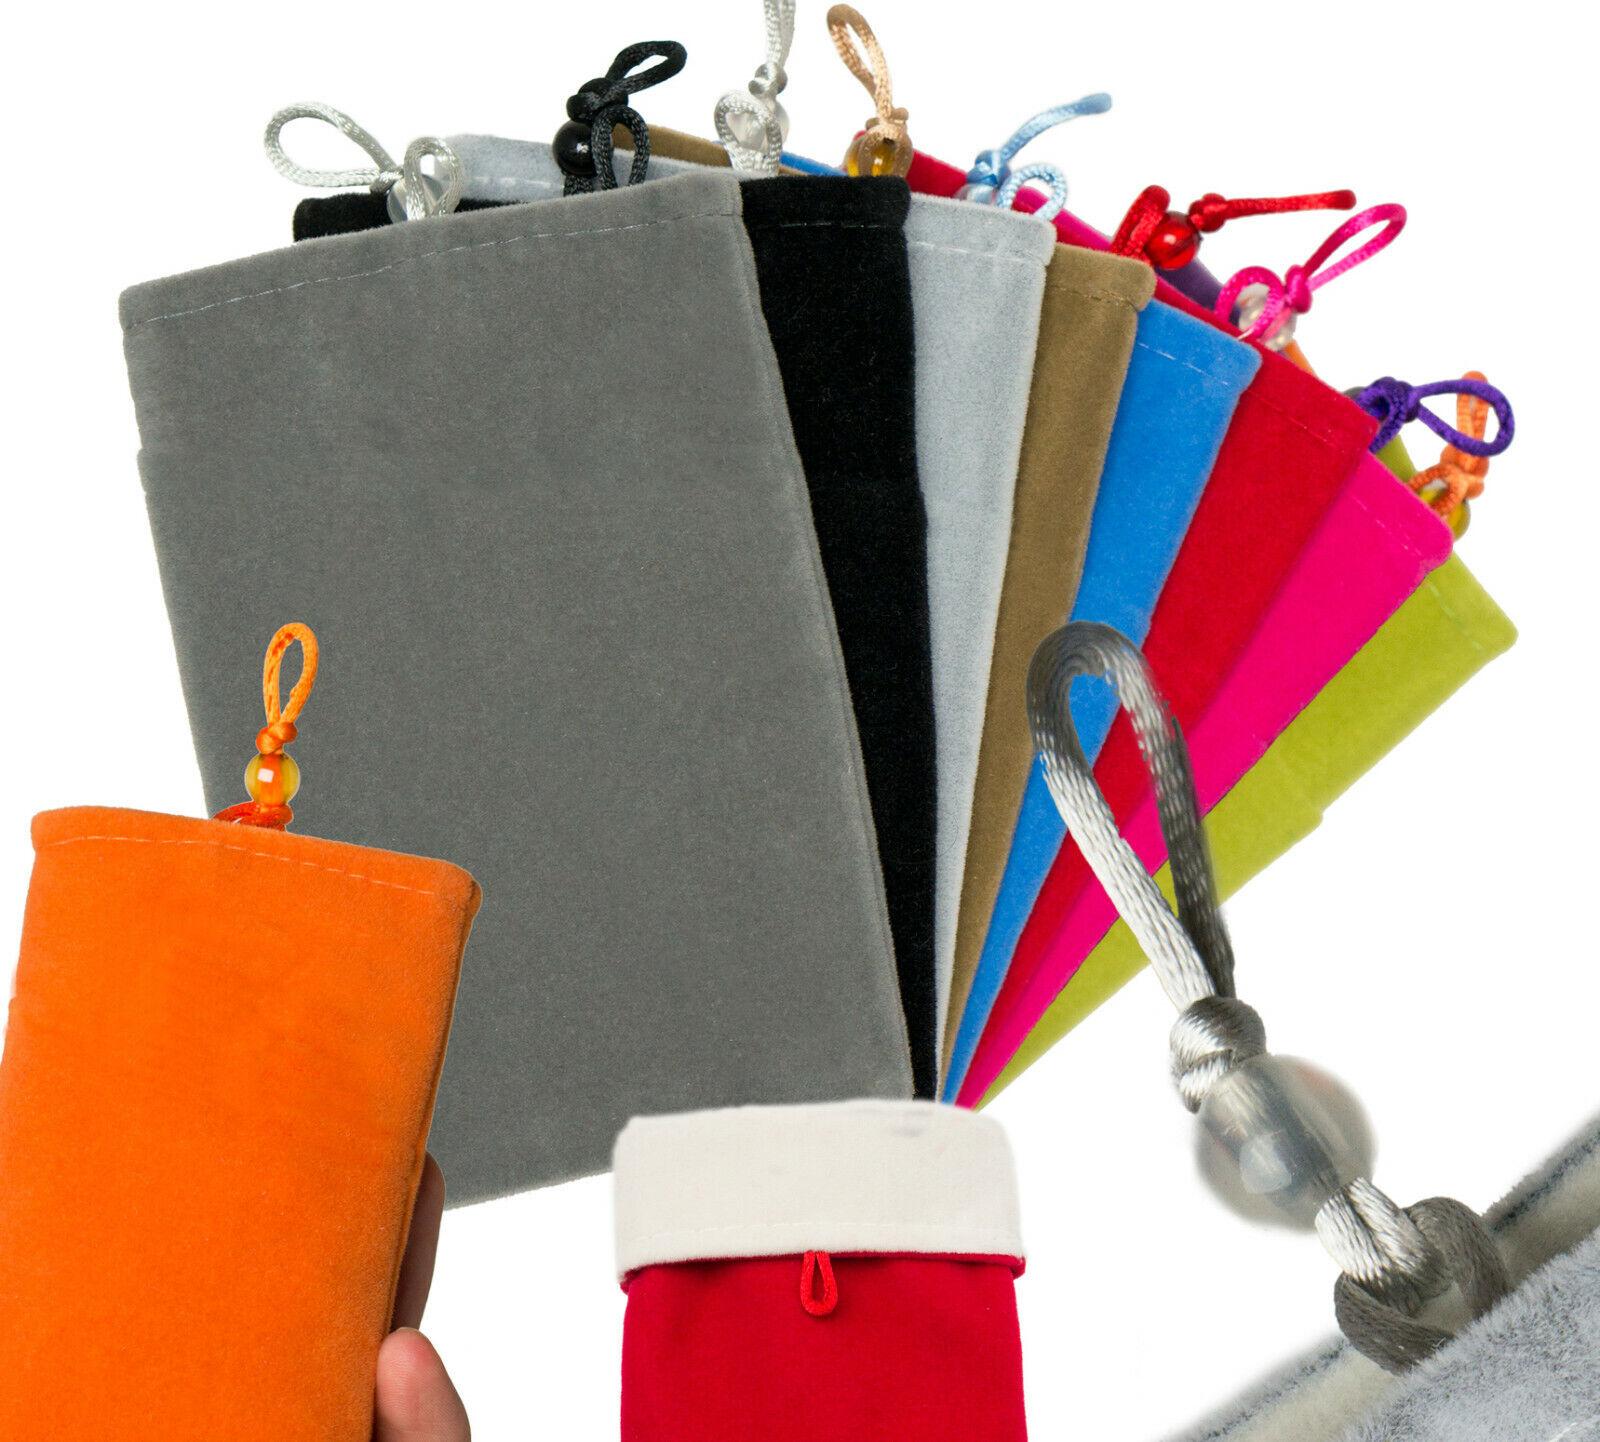 Handysocke Schutzhülle Handy Hülle Tasche Etui Case Cover Textil Schale Etui